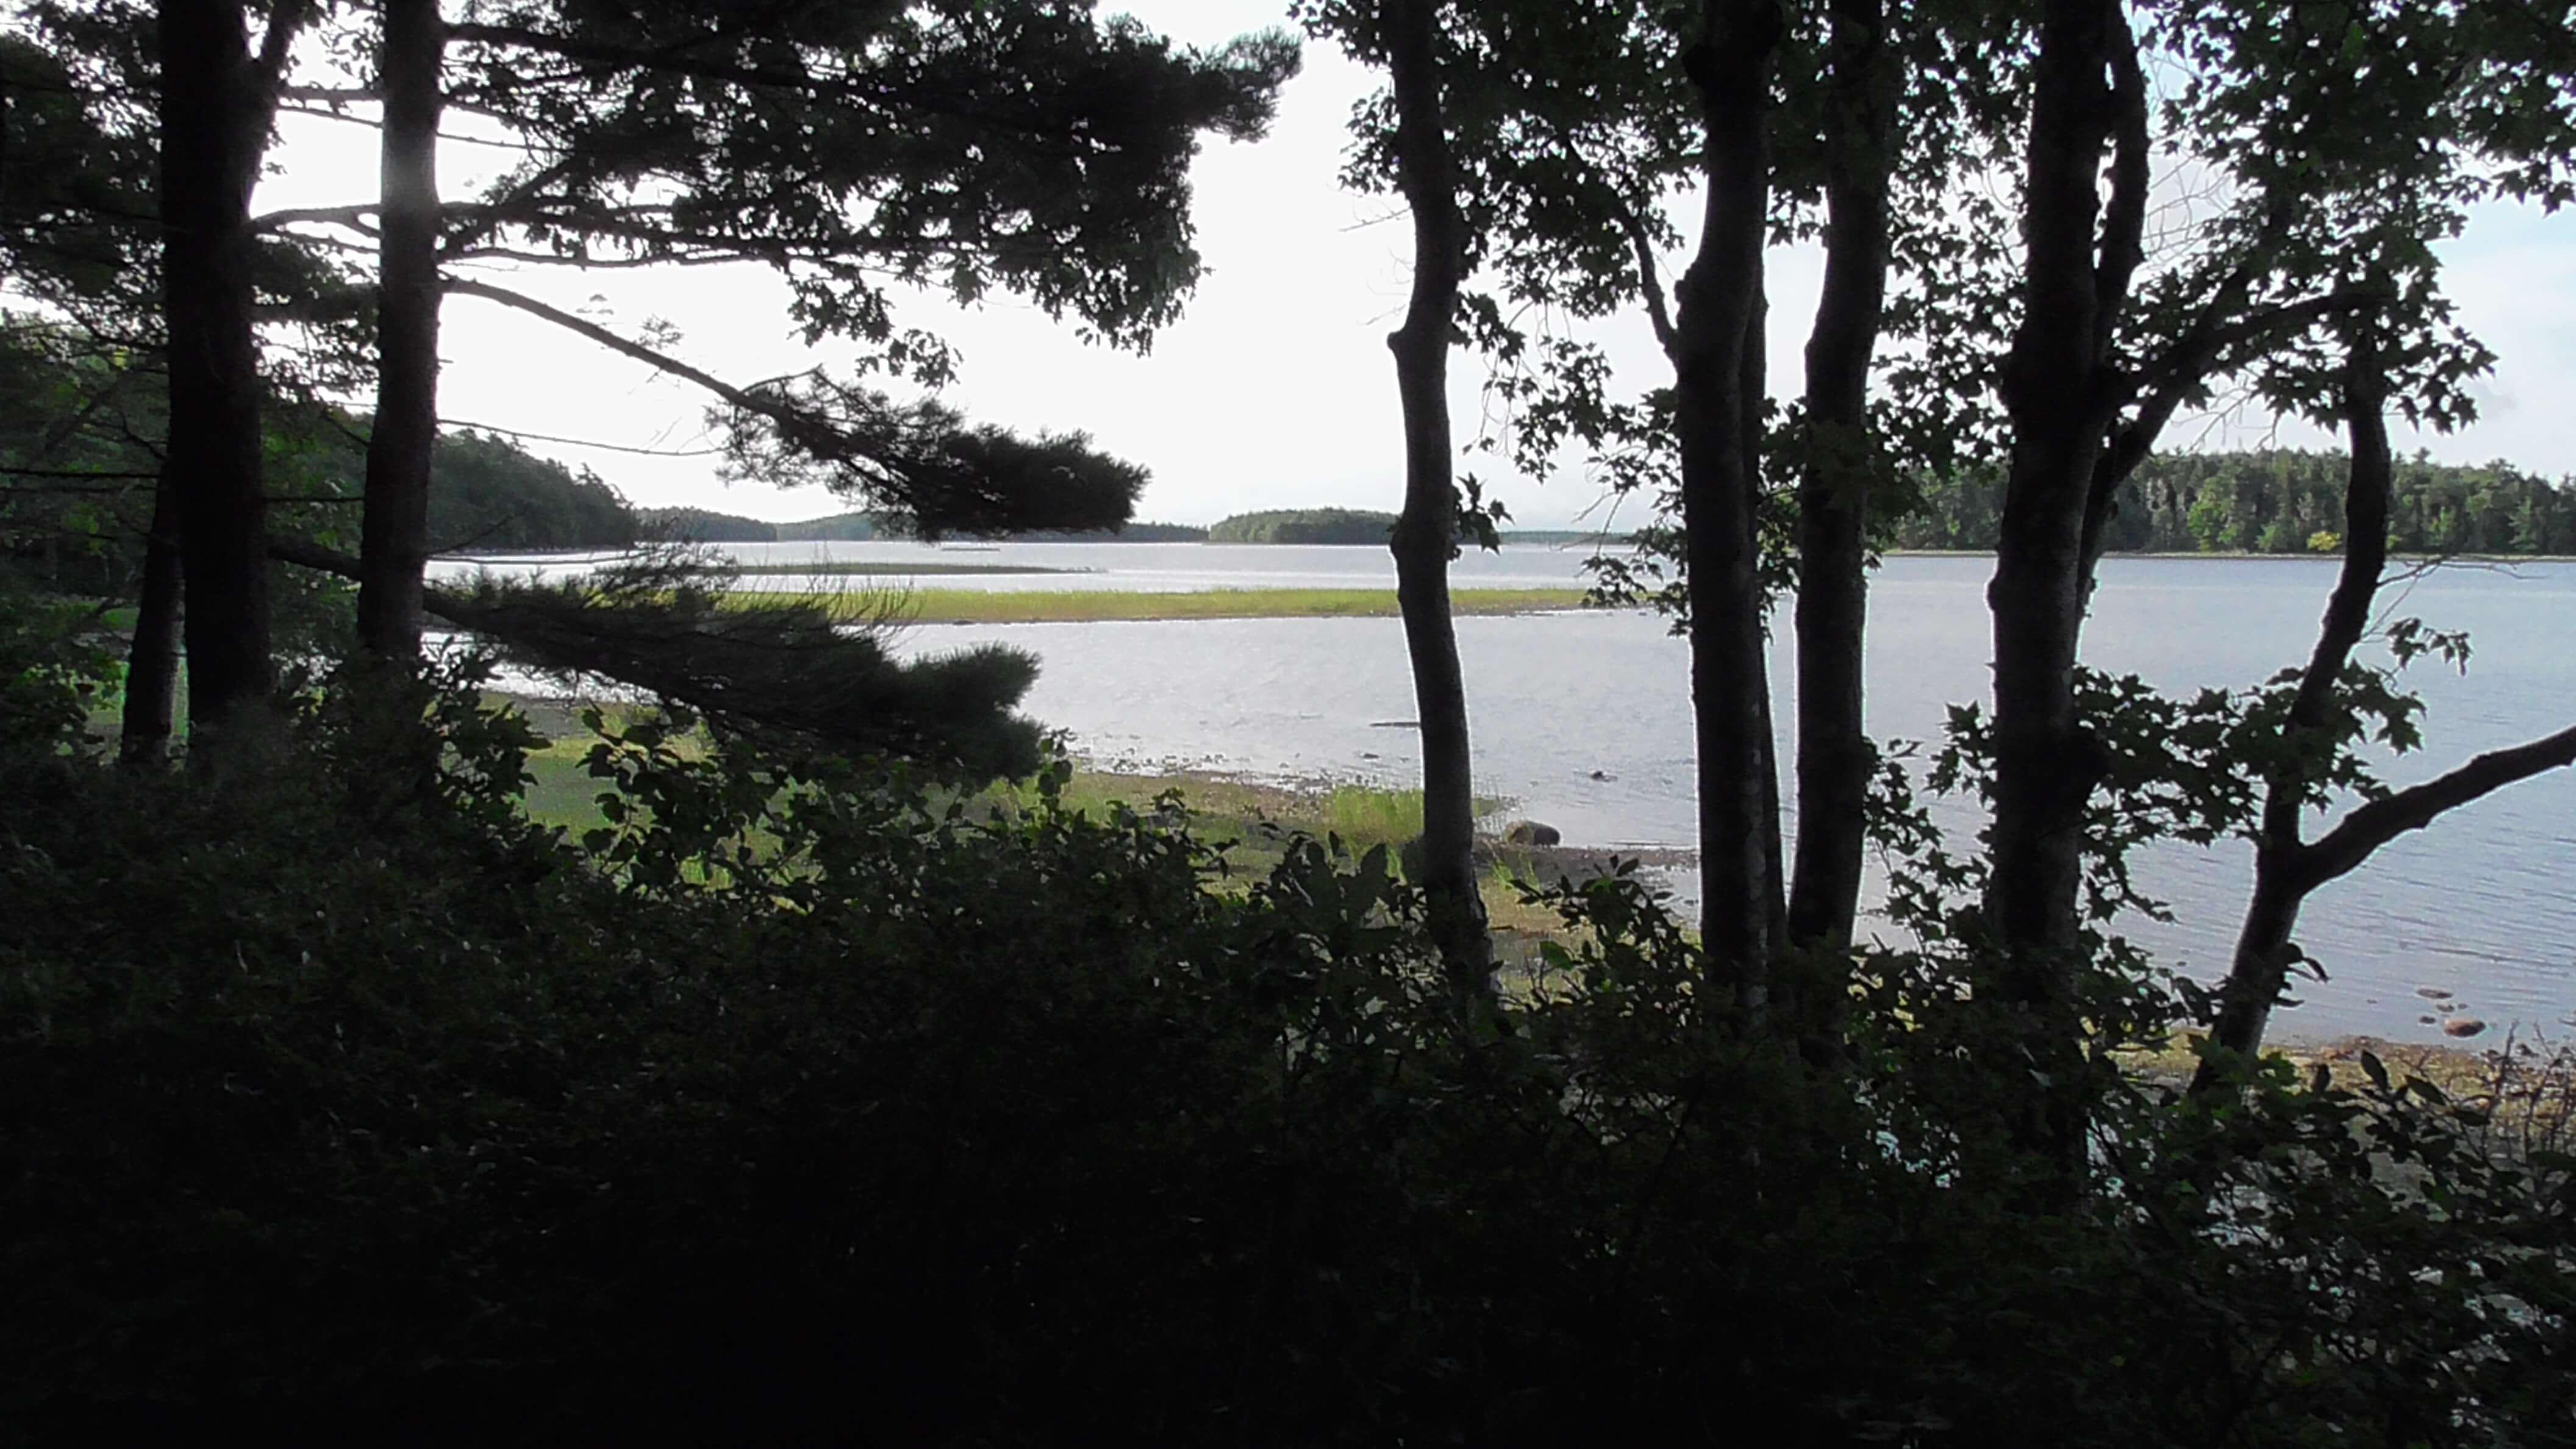 View from Camp Site, Kejimkujik National Park, Nova Scotia